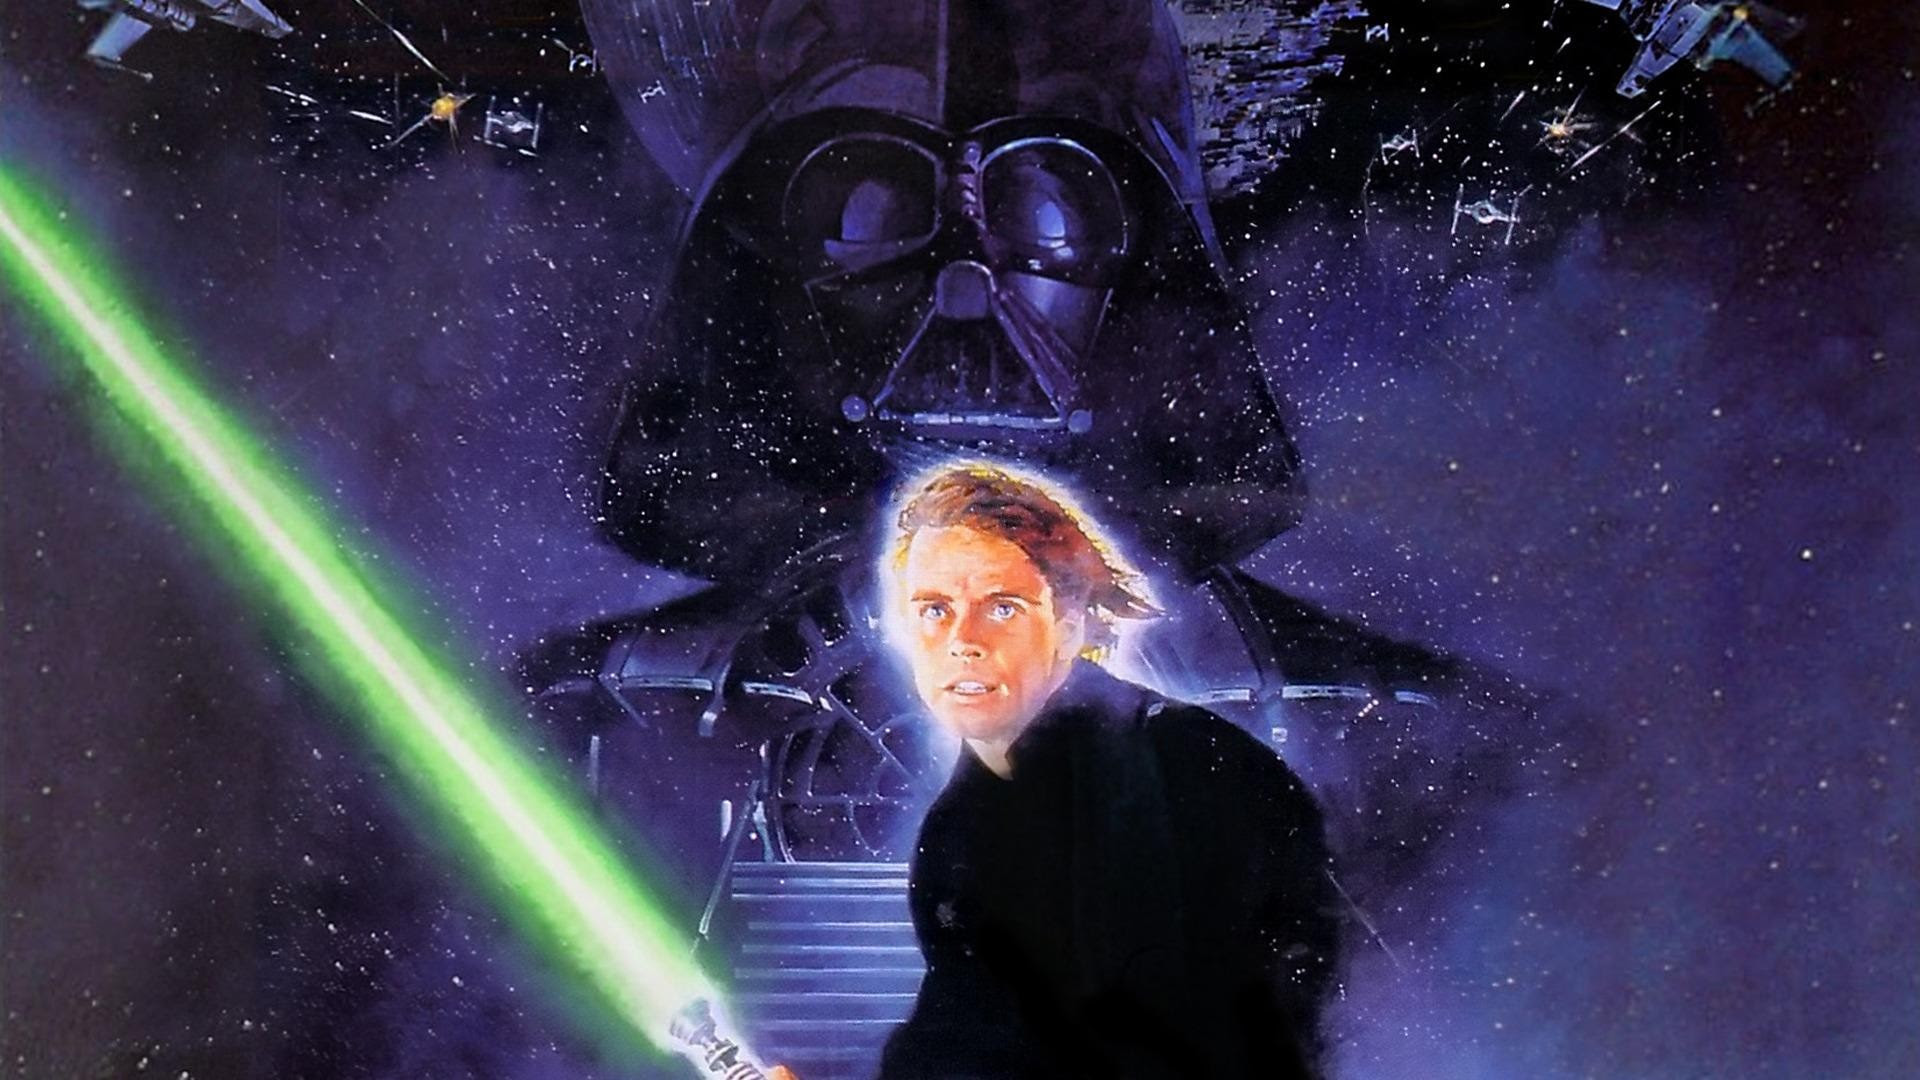 Star Wars Luke Skywalker Wallpaper 72 Images